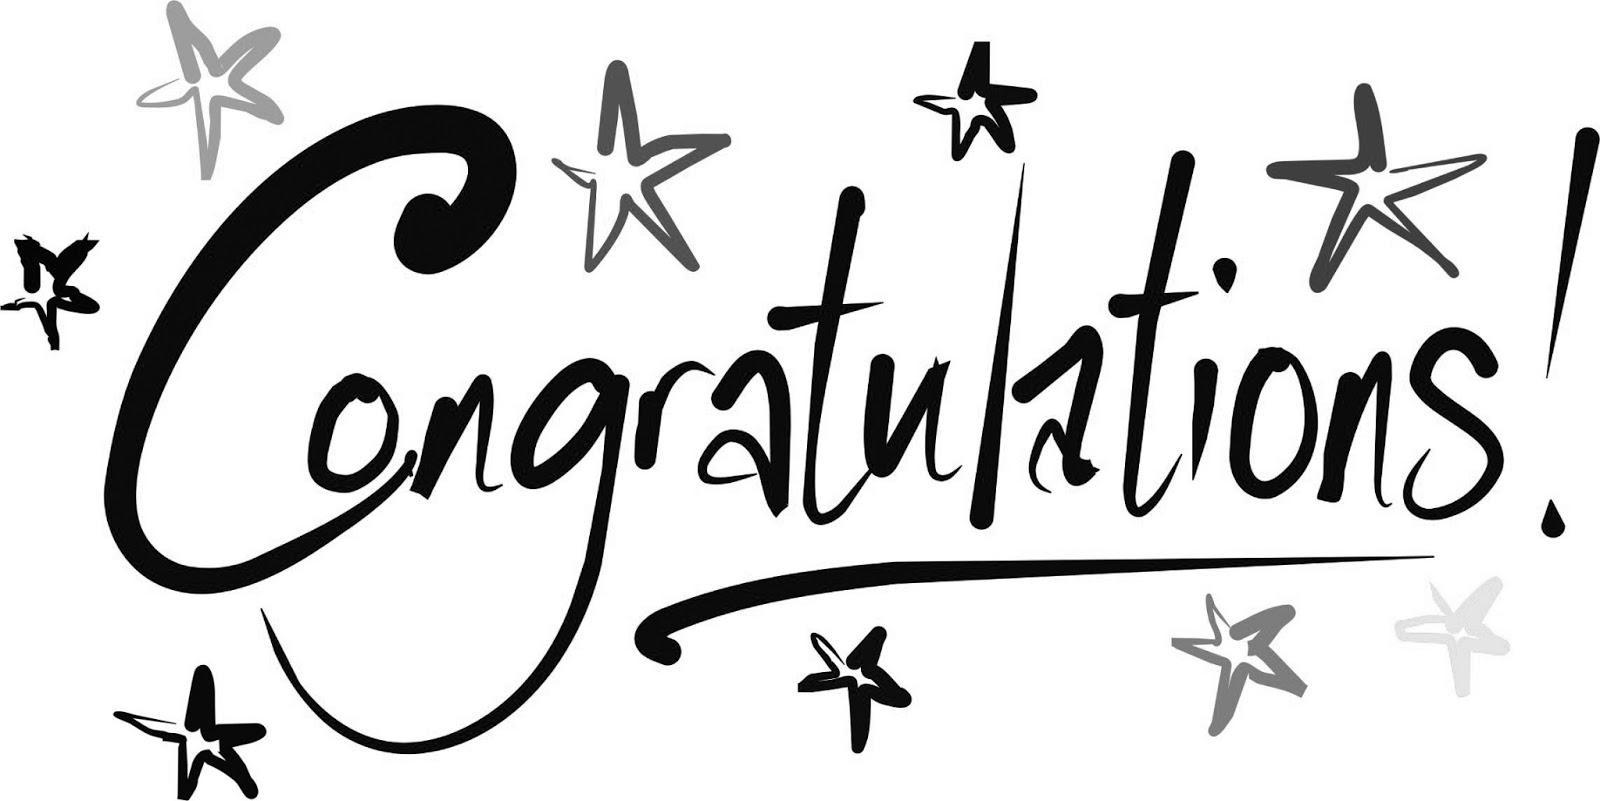 Engagement clipart congratulation graduates. Congratulations images incep imagine